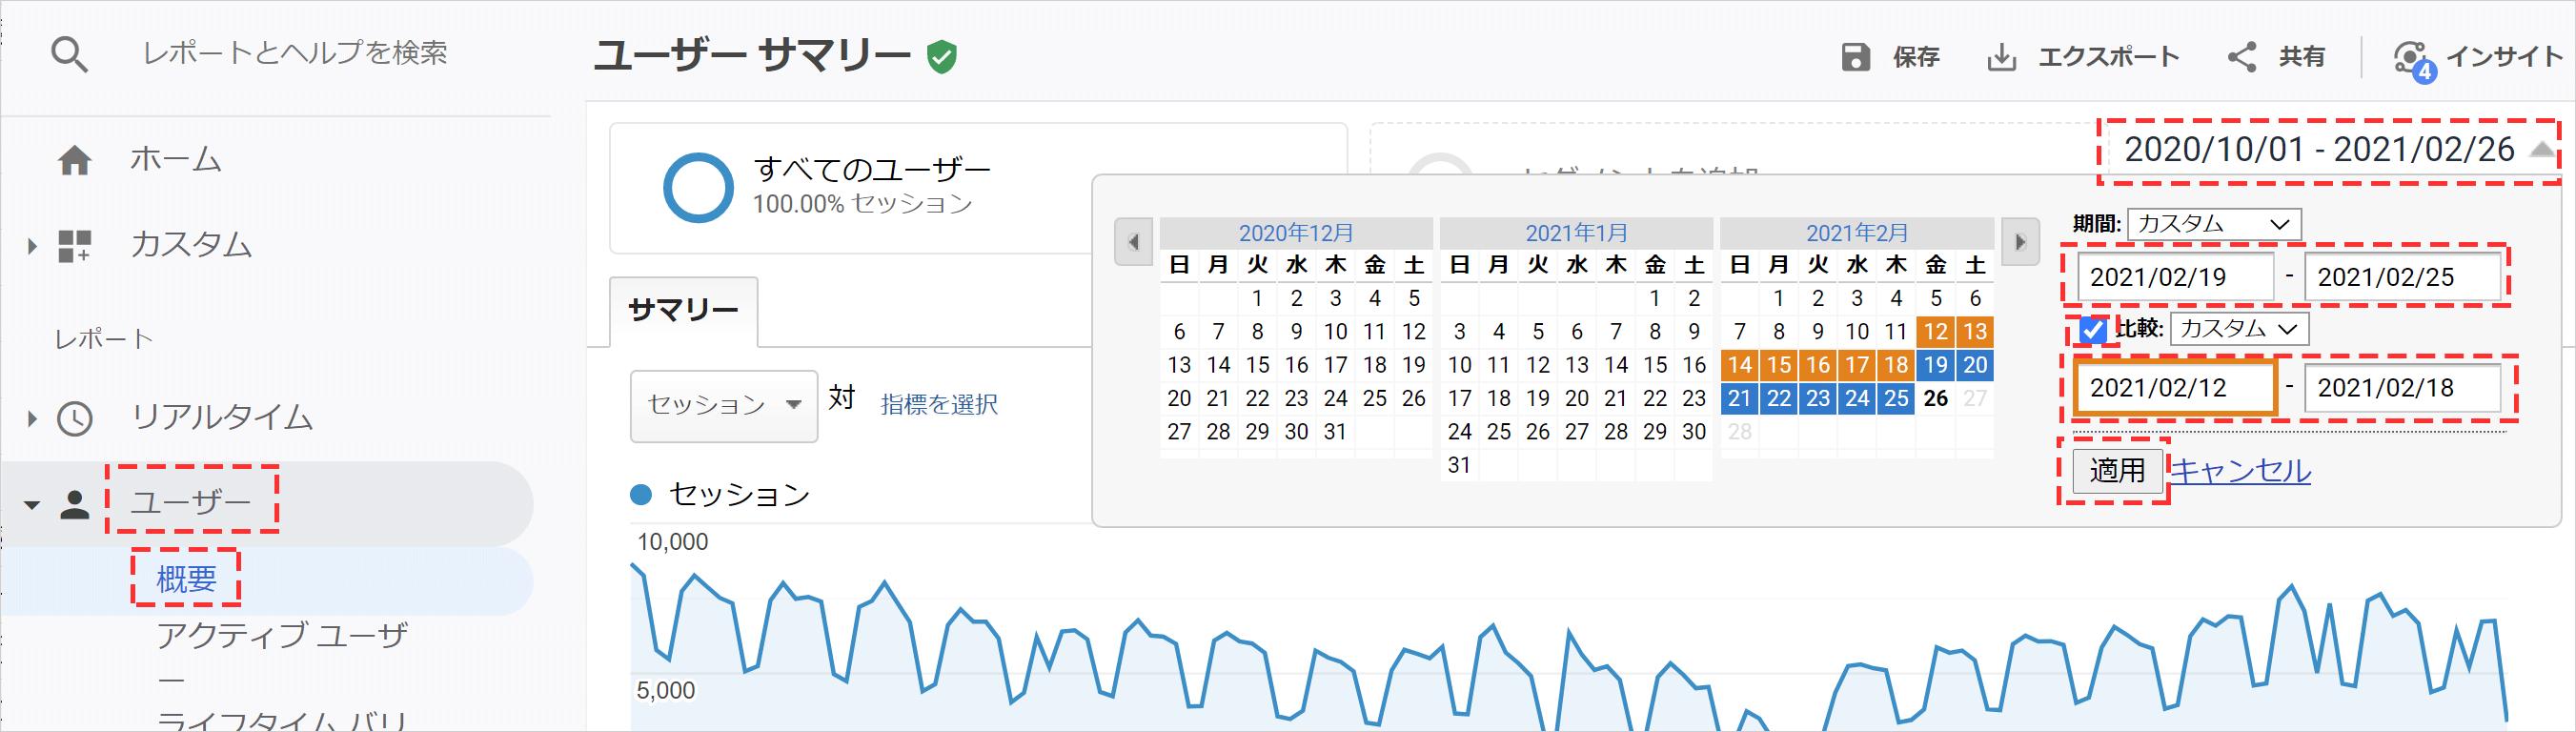 Googleアナリティクスで過去の期間と比較してアクセス数を調べる